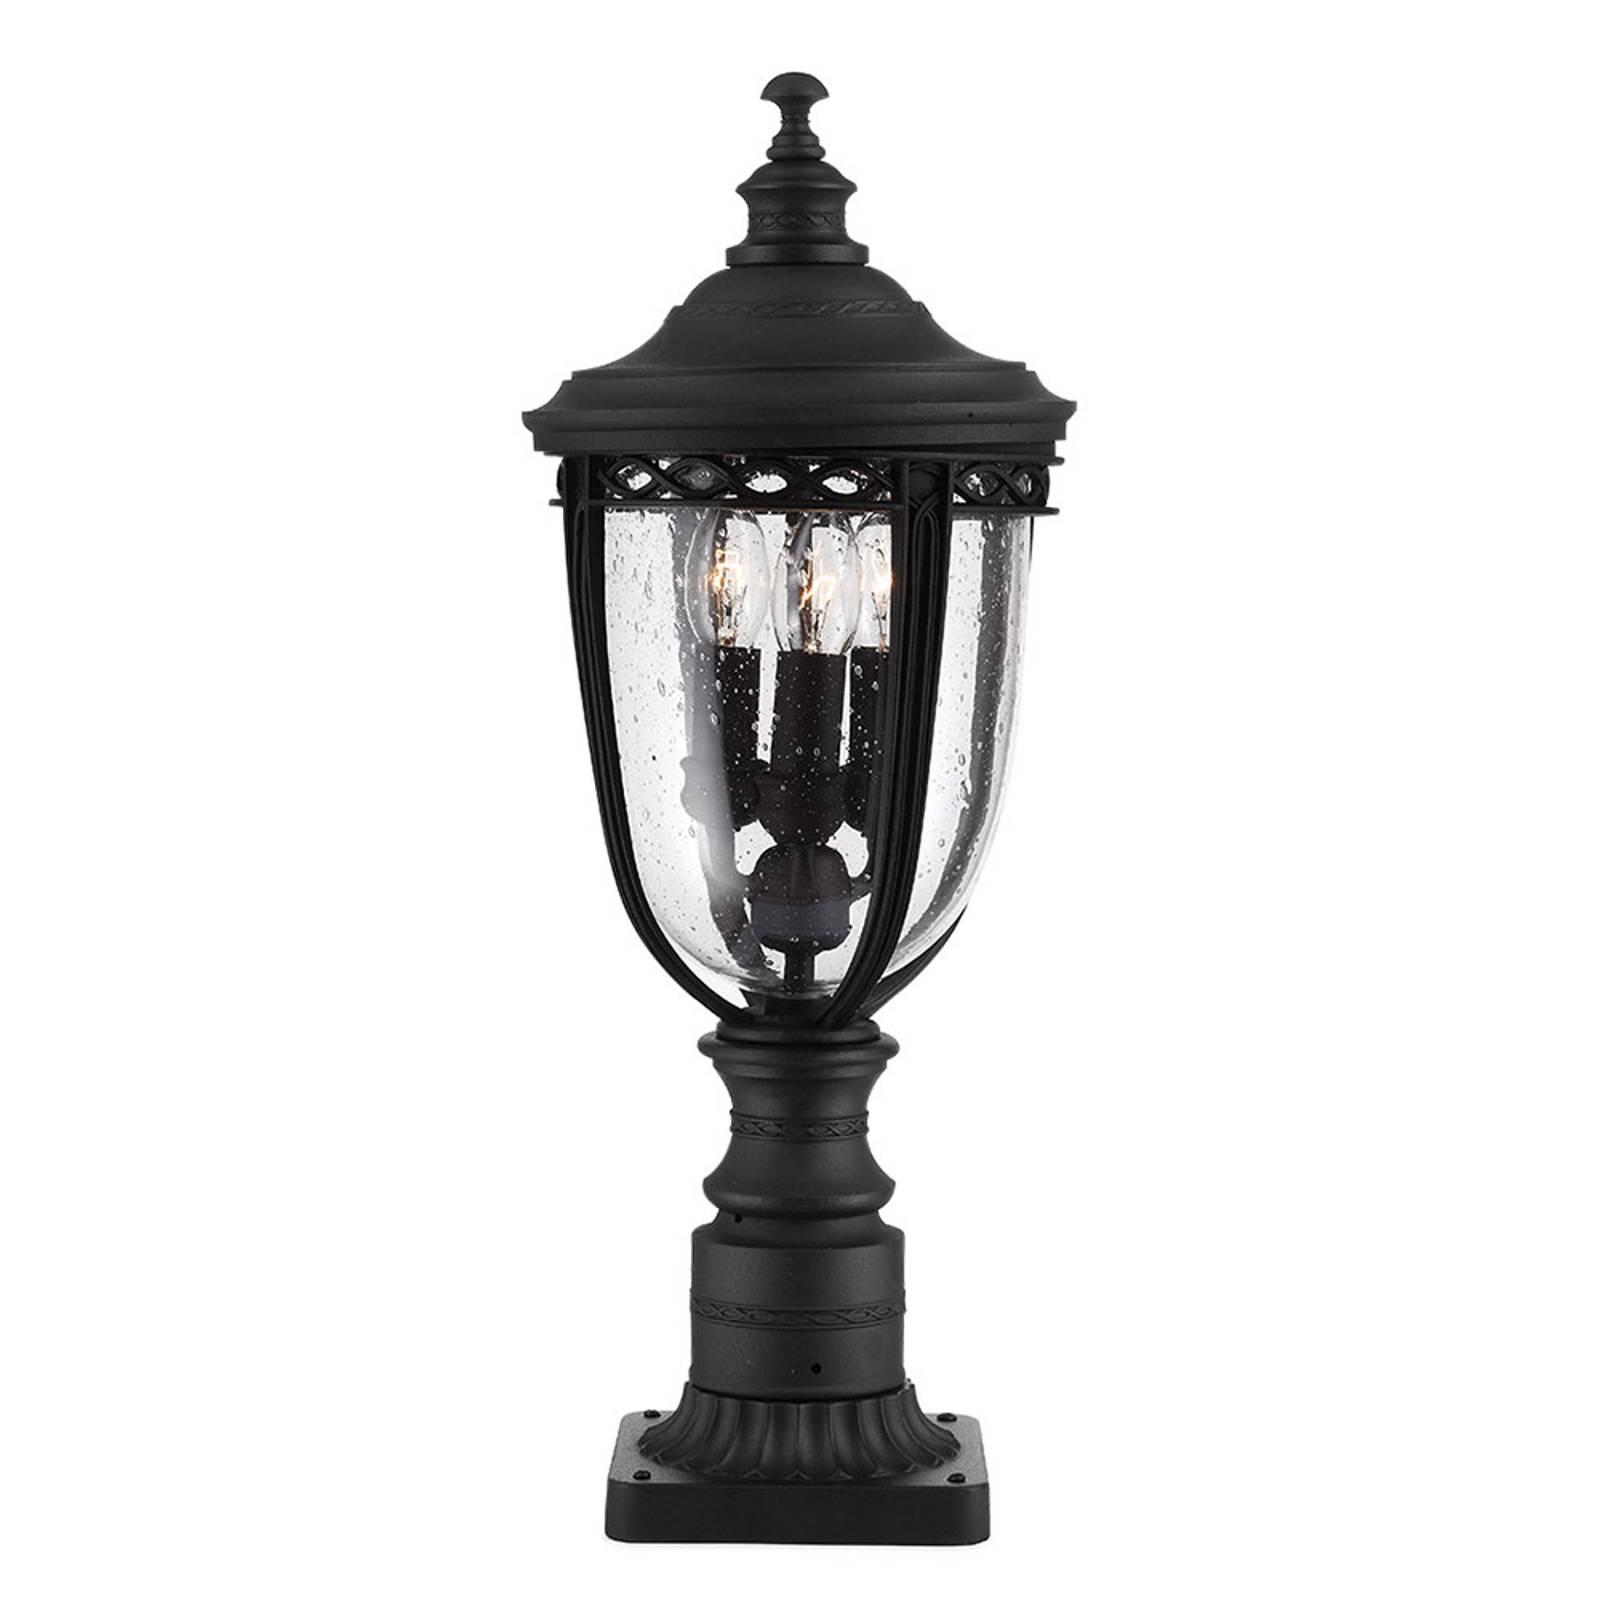 Pollarilamppu English Bridle, musta